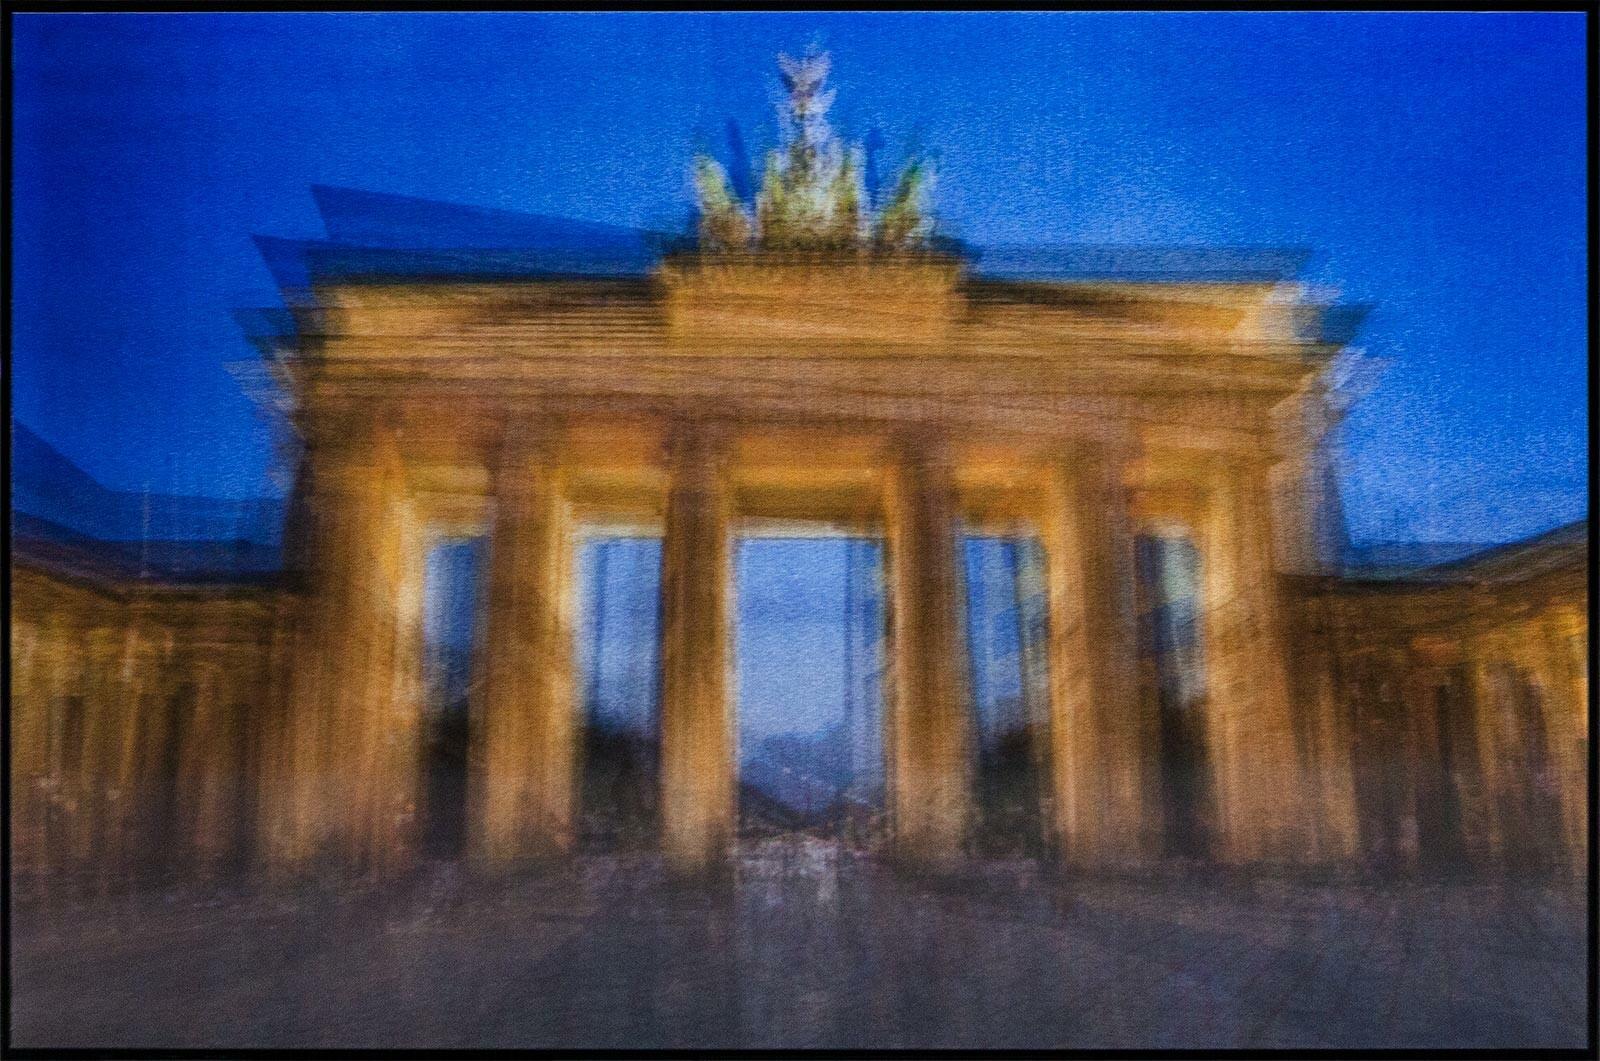 Brandenburger Gate, Day and Night - Pep Ventosa